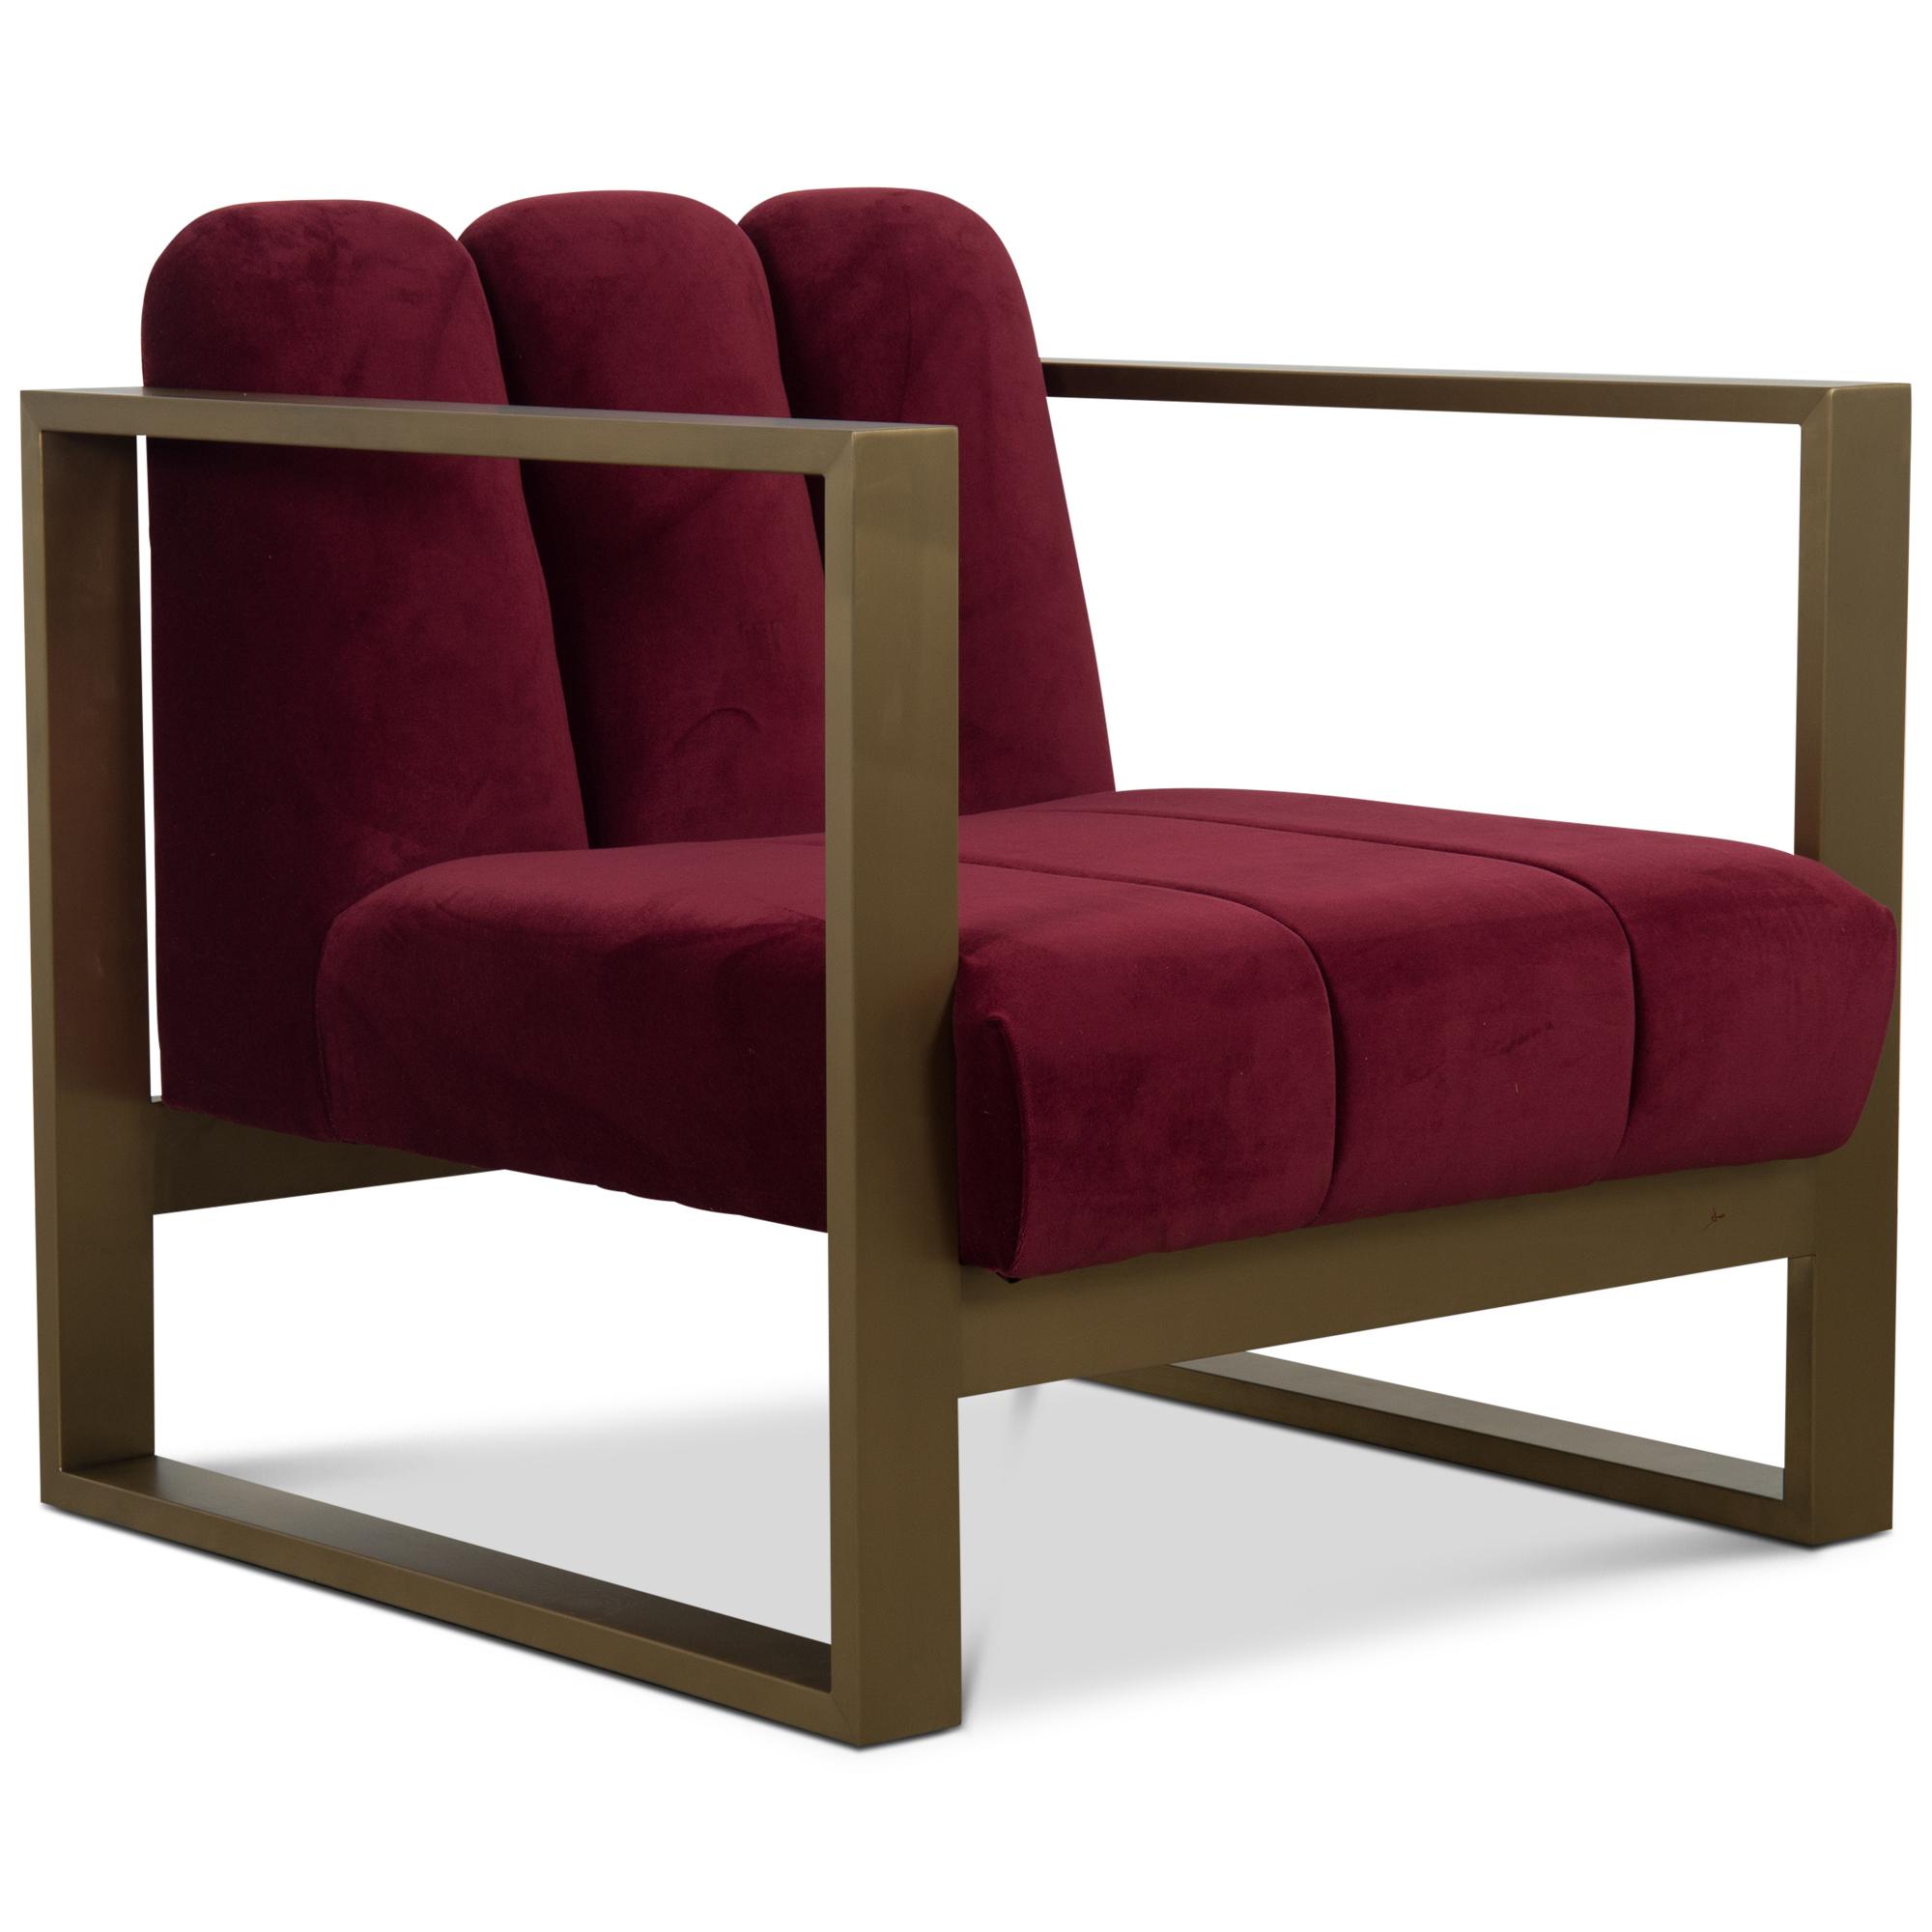 Leo scallop kube chair modshop zodiac design